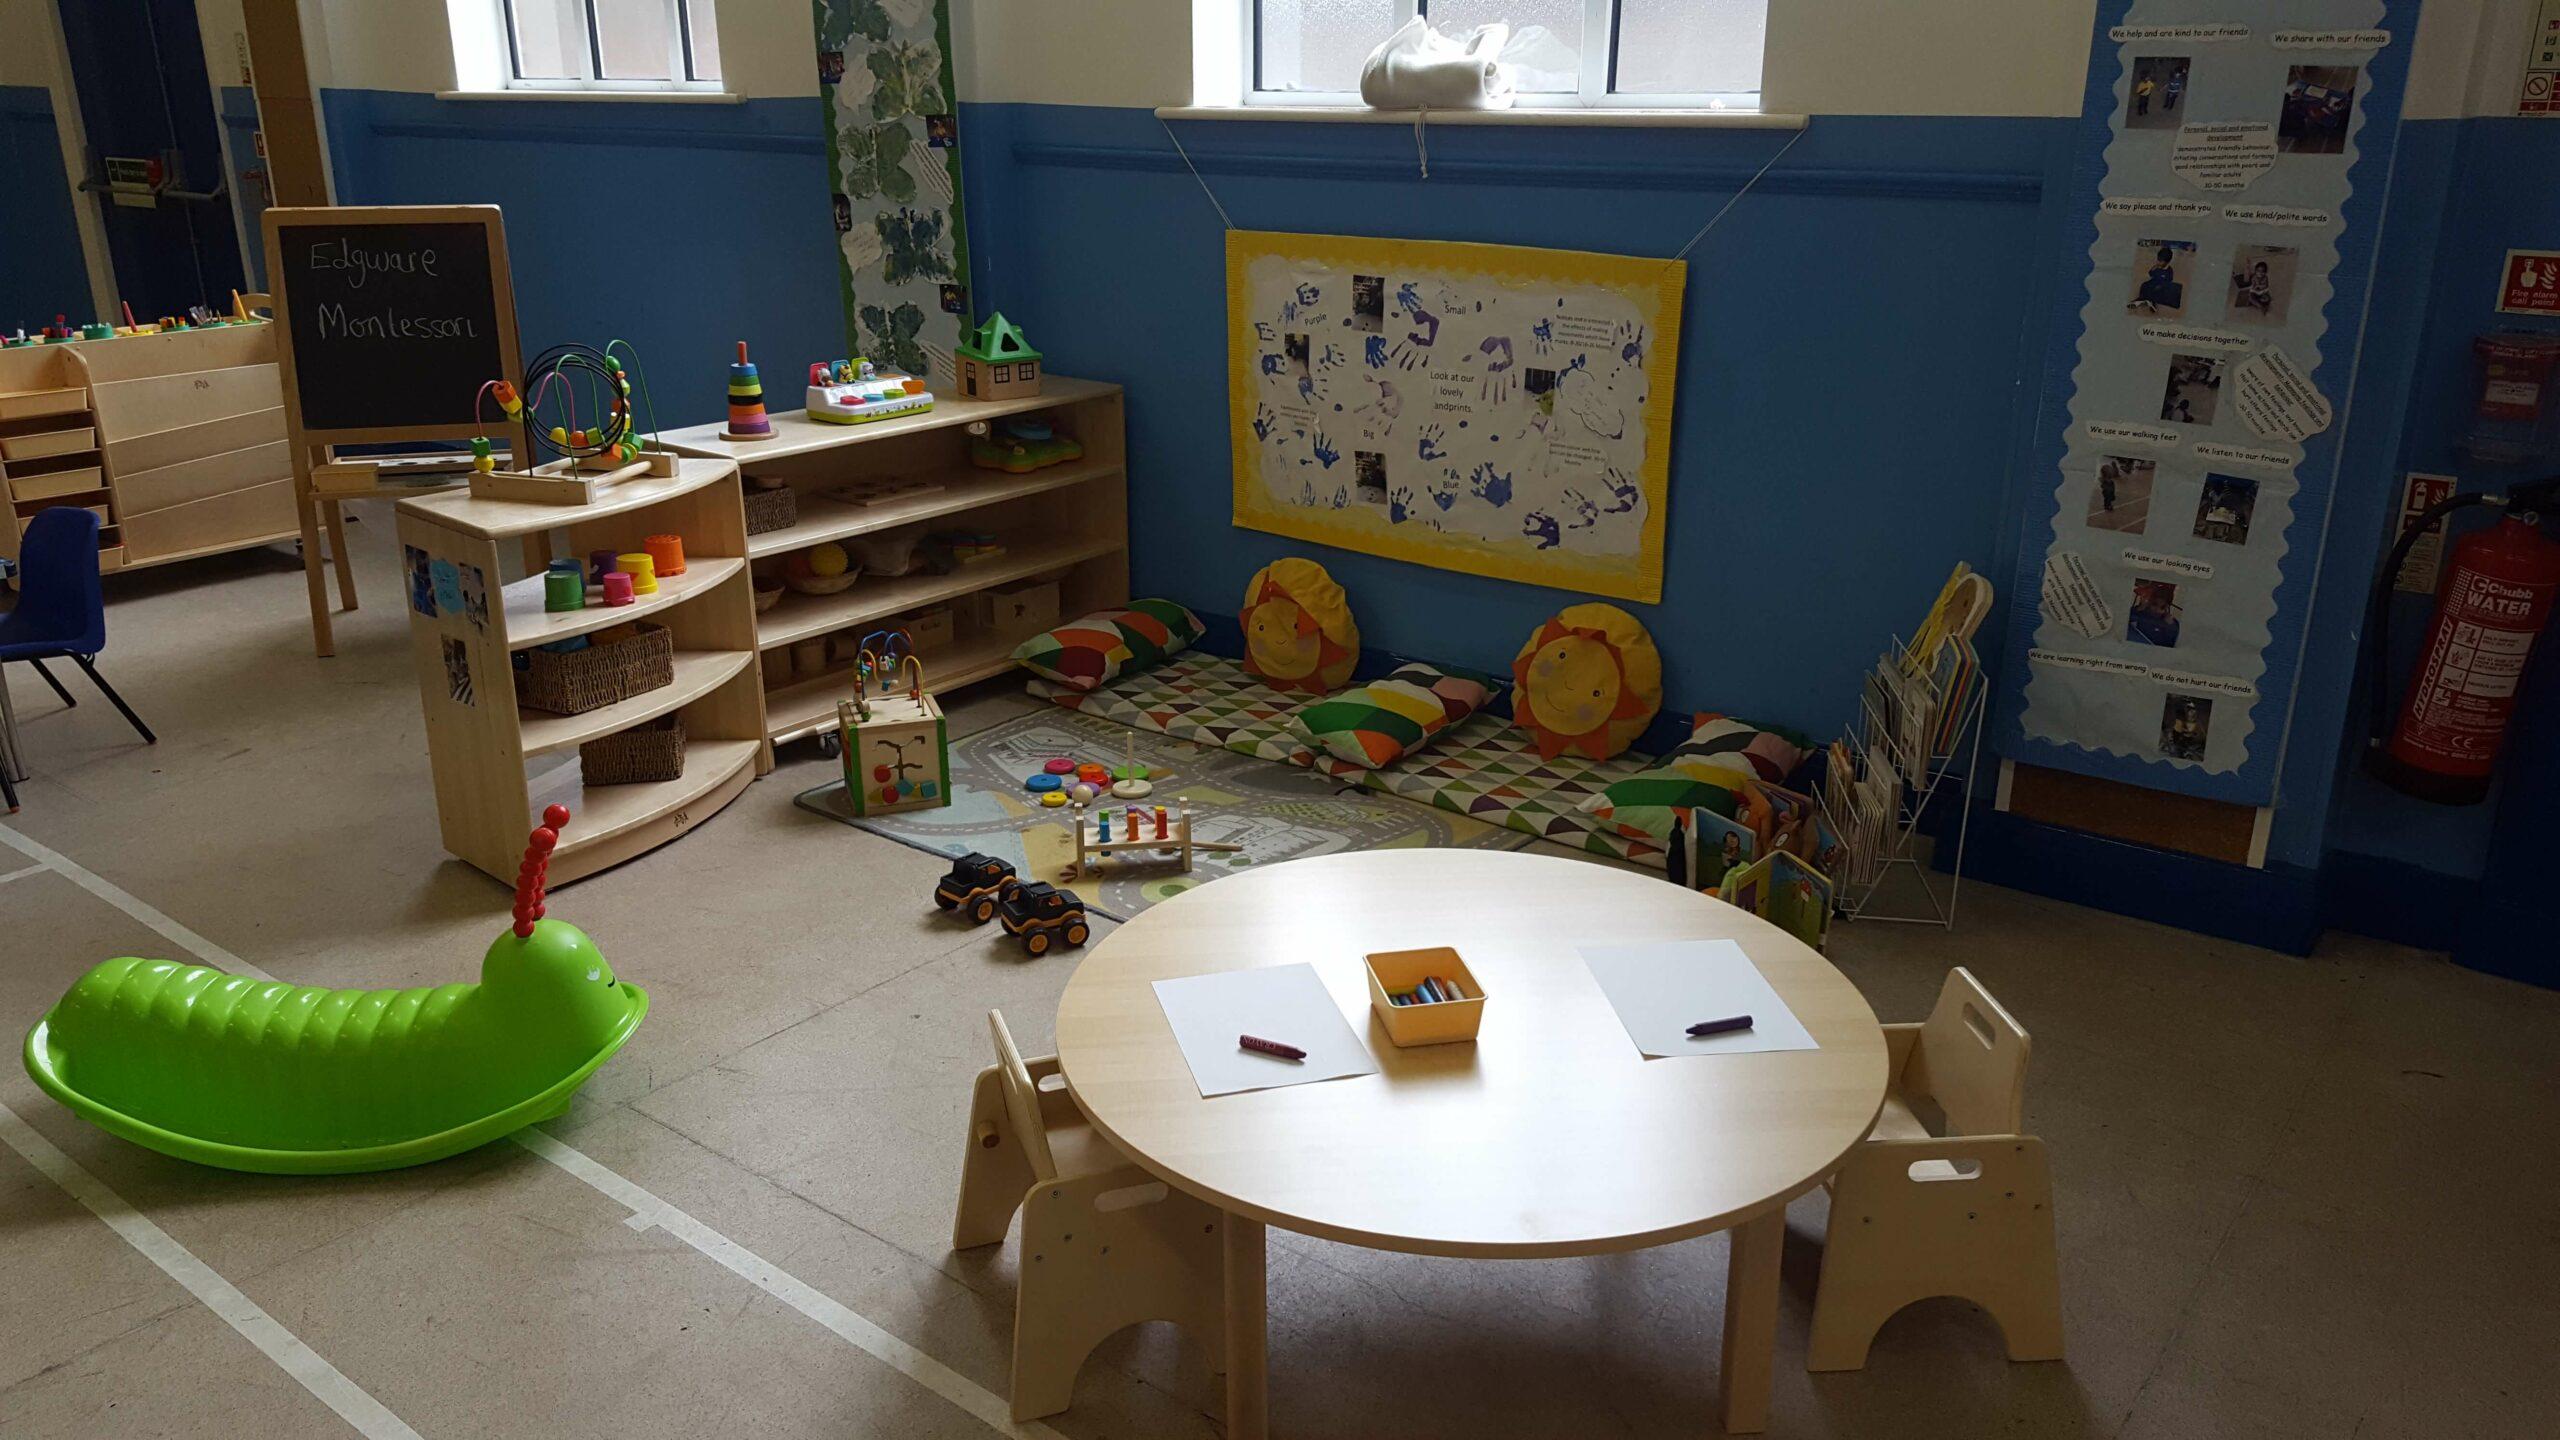 Edgware Montessori